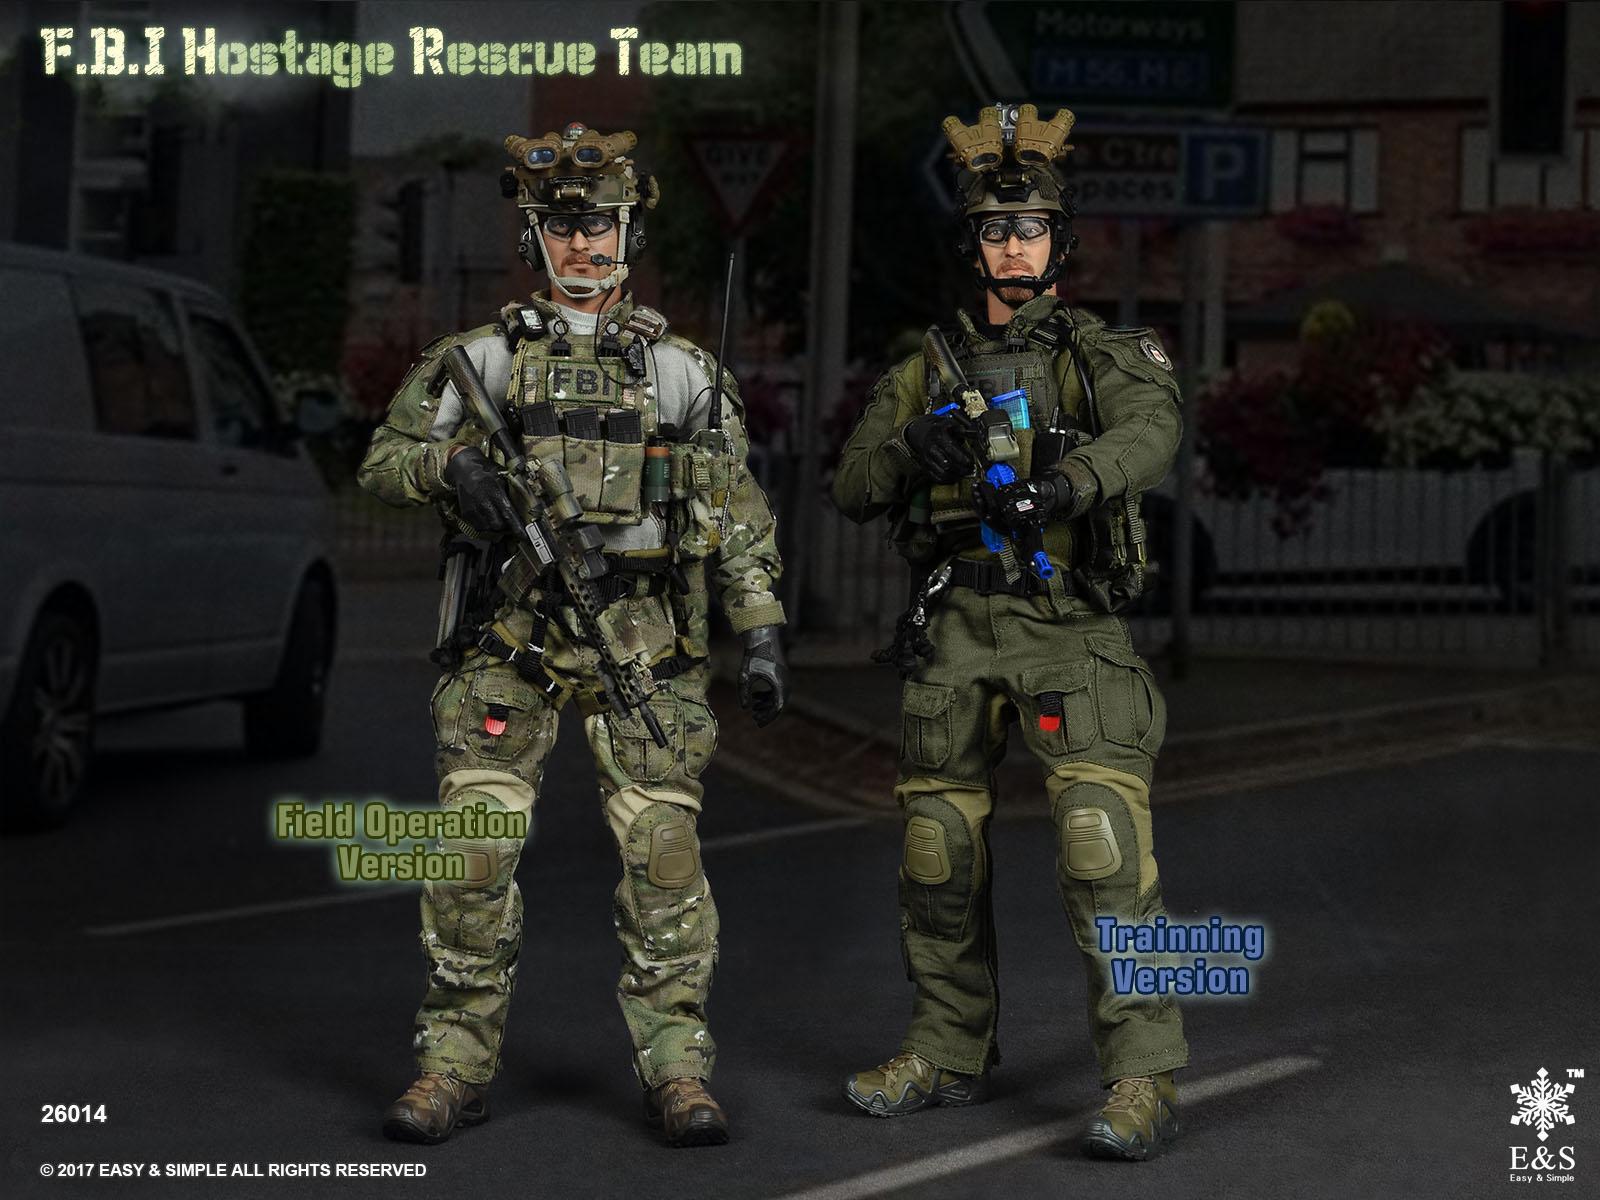 Easy&Simple 26014A, 26014B FBI Hostage Rescue Team (Field Operation Version, Training Version)